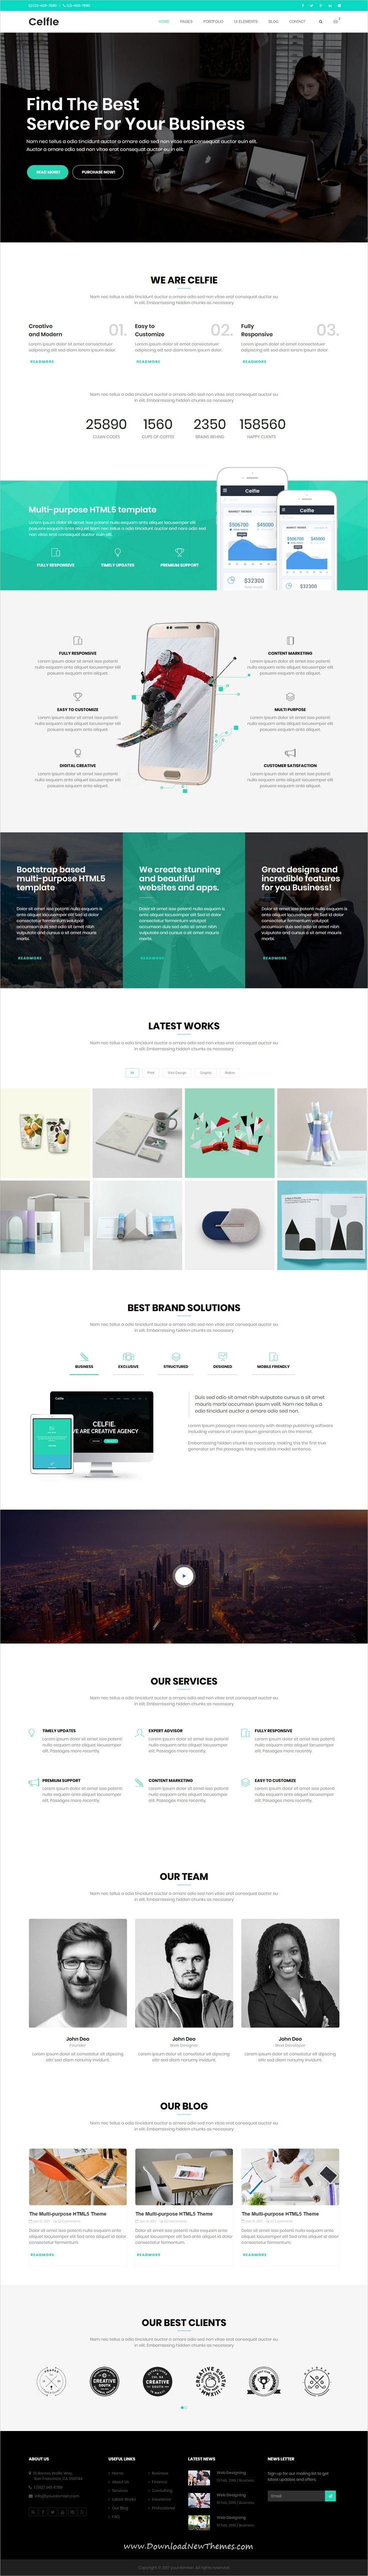 Celfie is clean and modern design responsive multipurpose